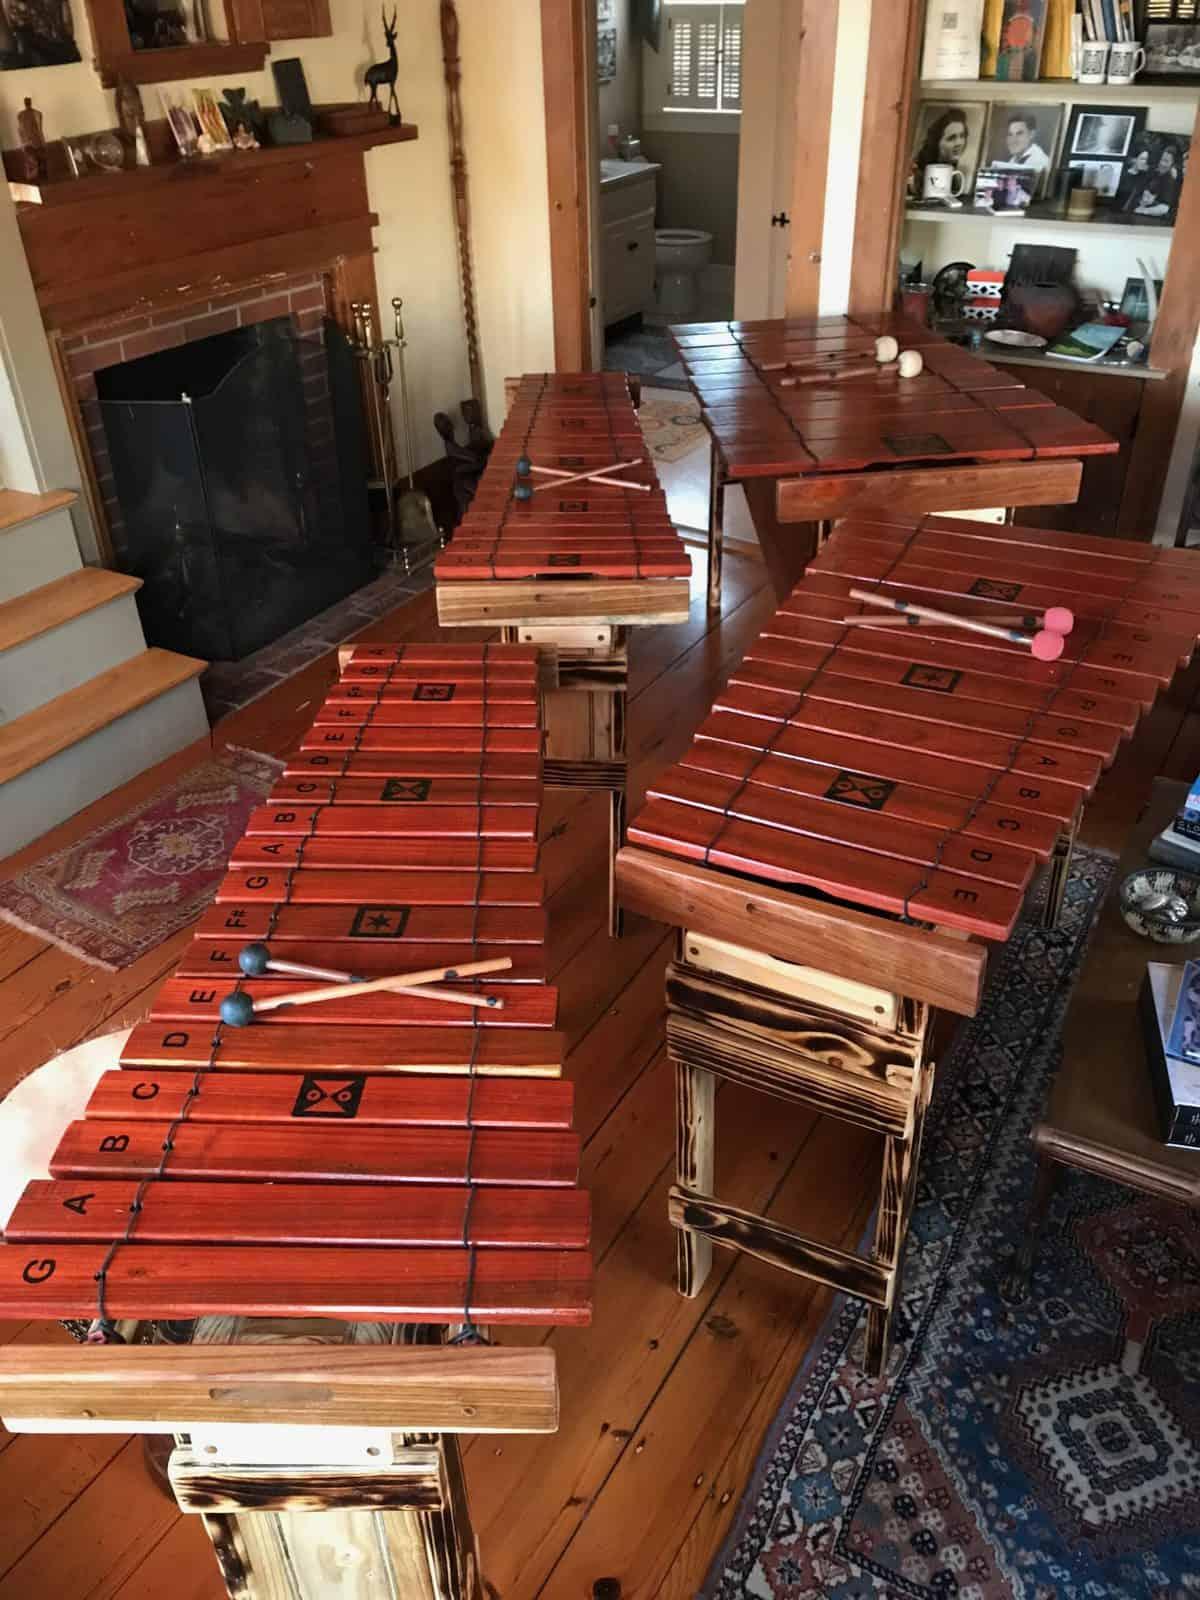 WorldBeat Marimba Band in Concert with Ben Baldwin and the Stairwells